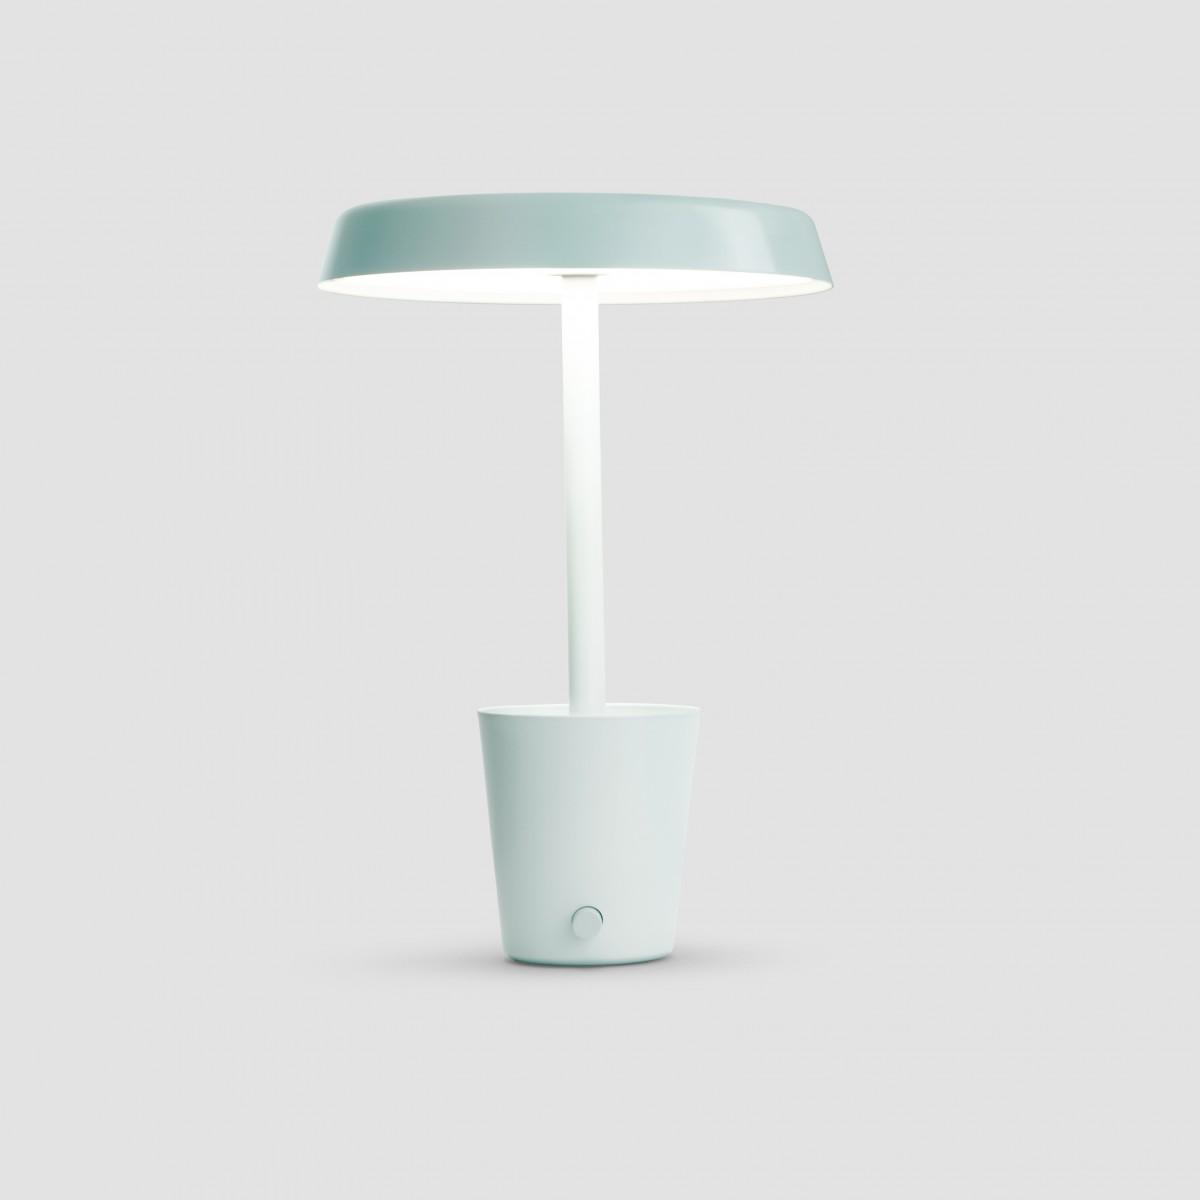 880270-473-cup_lamp-002_1_1.jpg